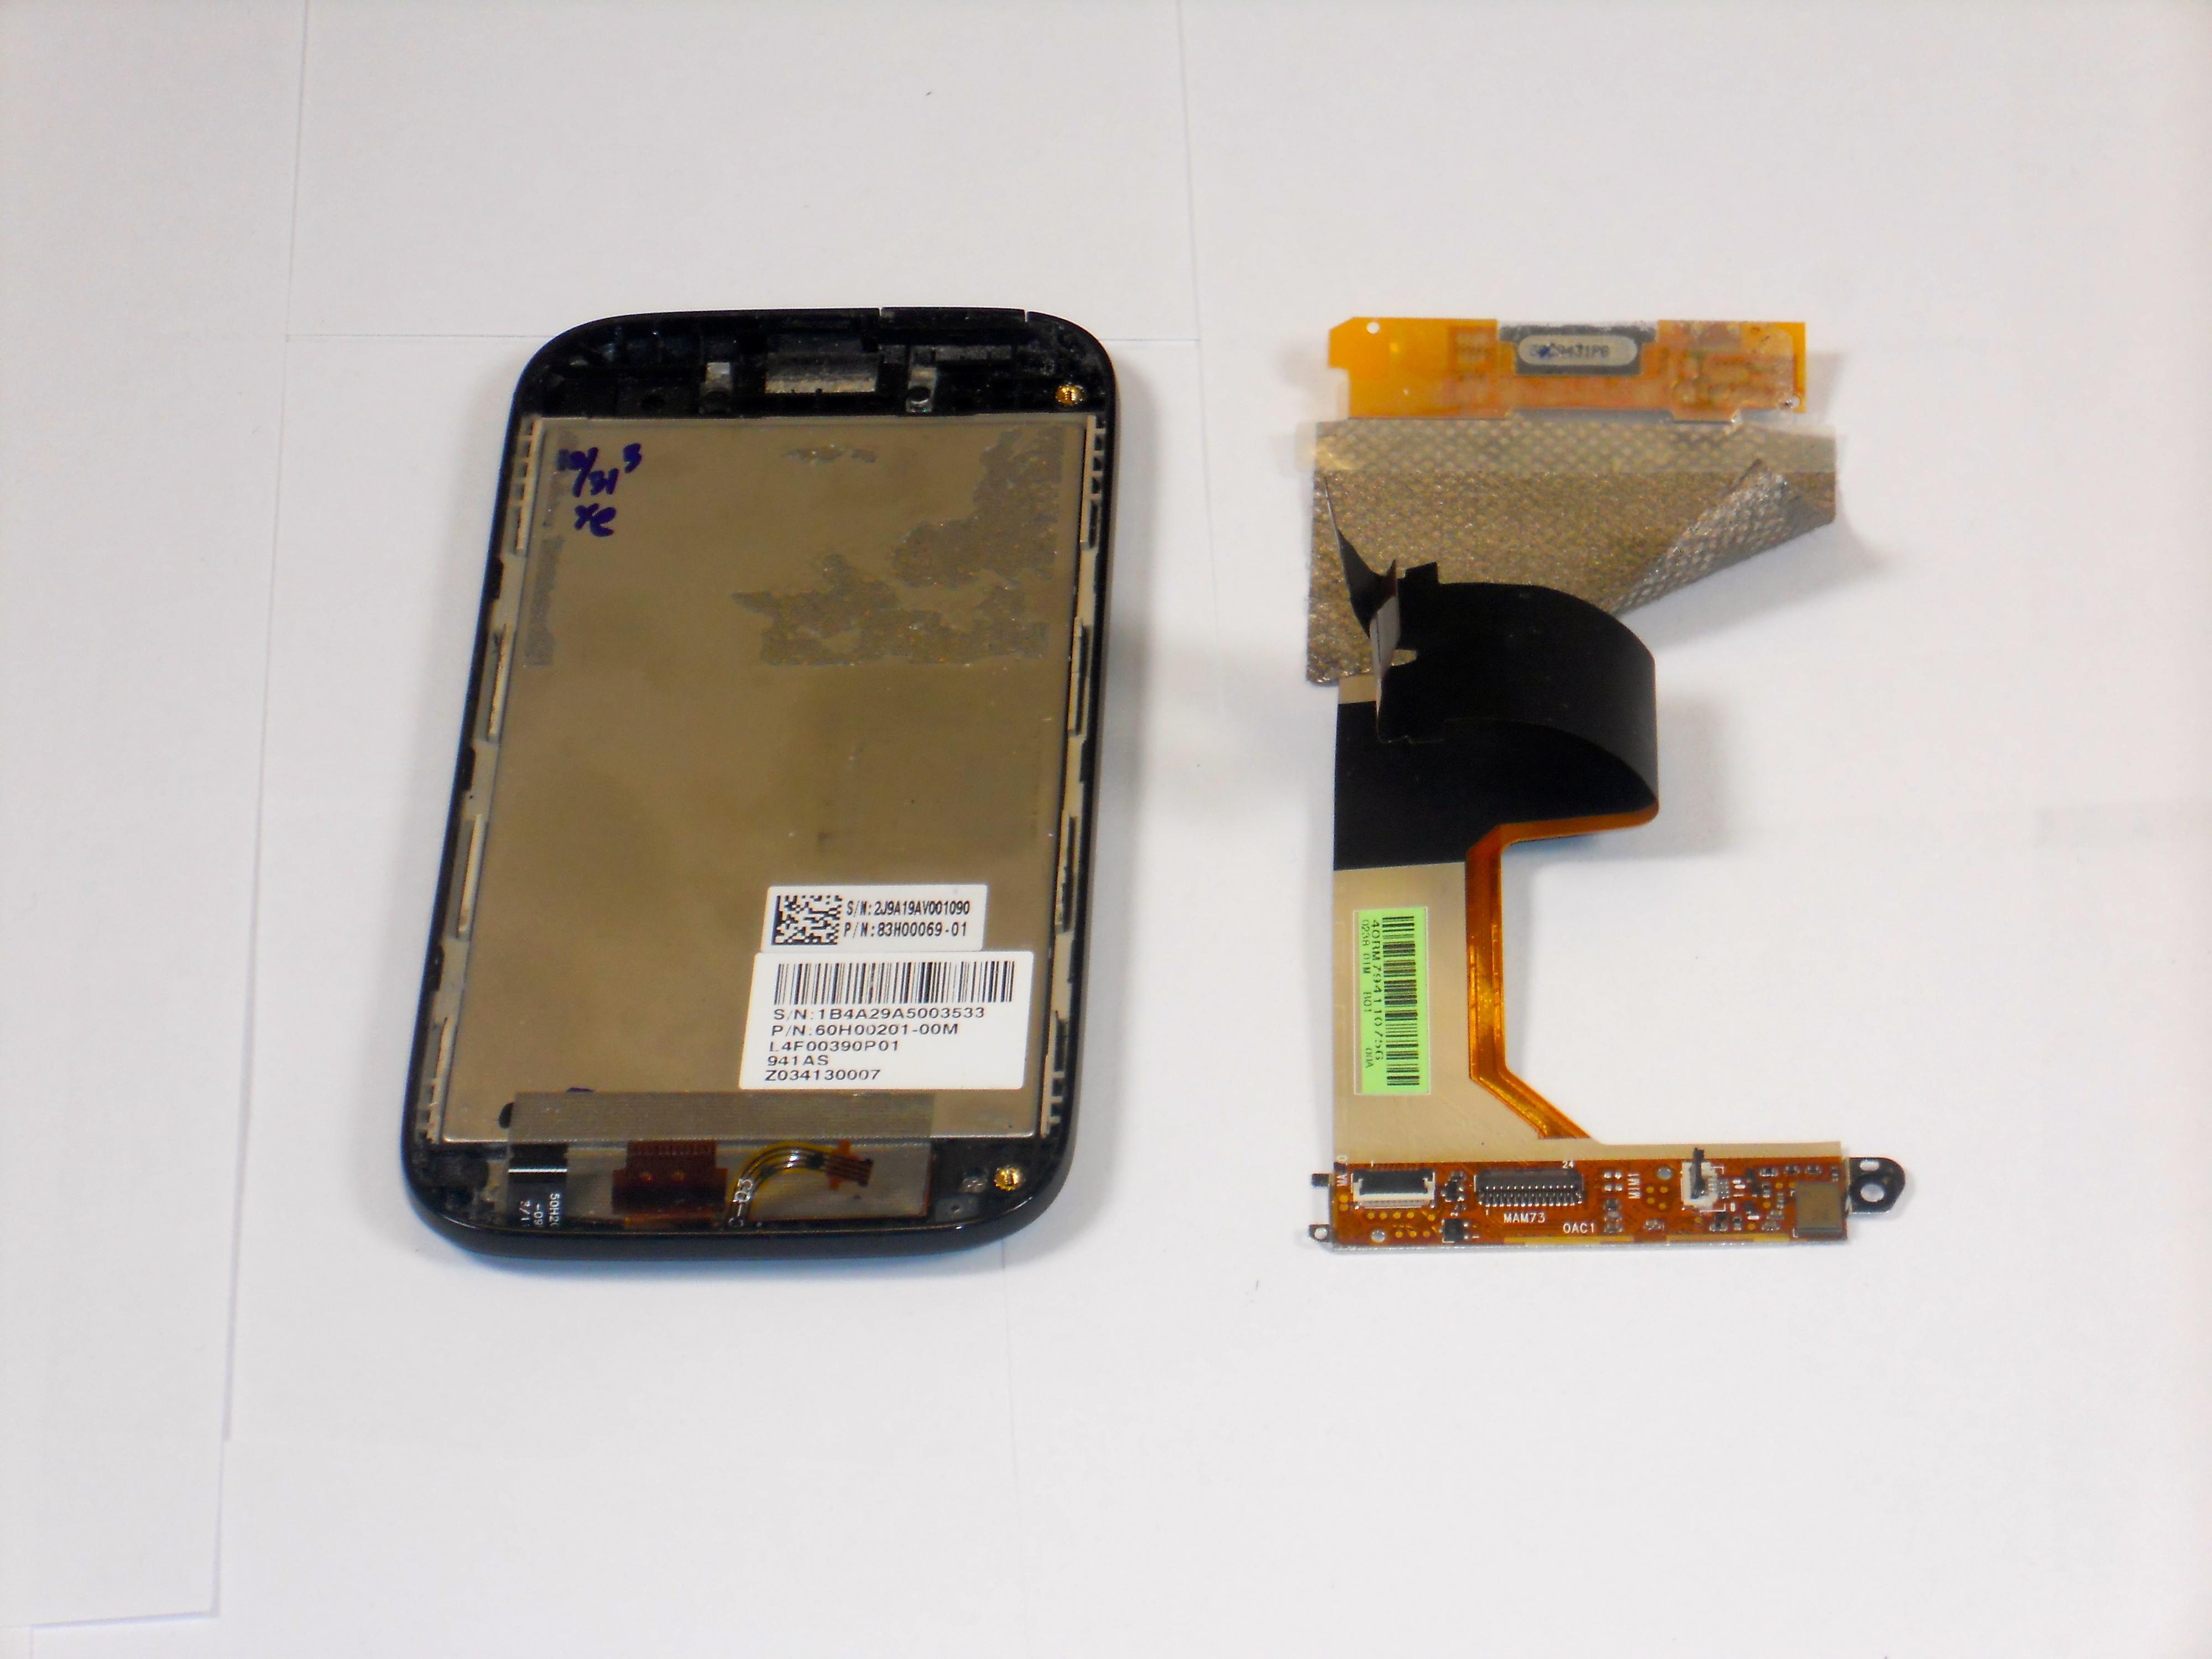 htc touch pro repair manual open source user manual u2022 rh dramatic varieties com HTC HD2 HTC Touch Diamond 2